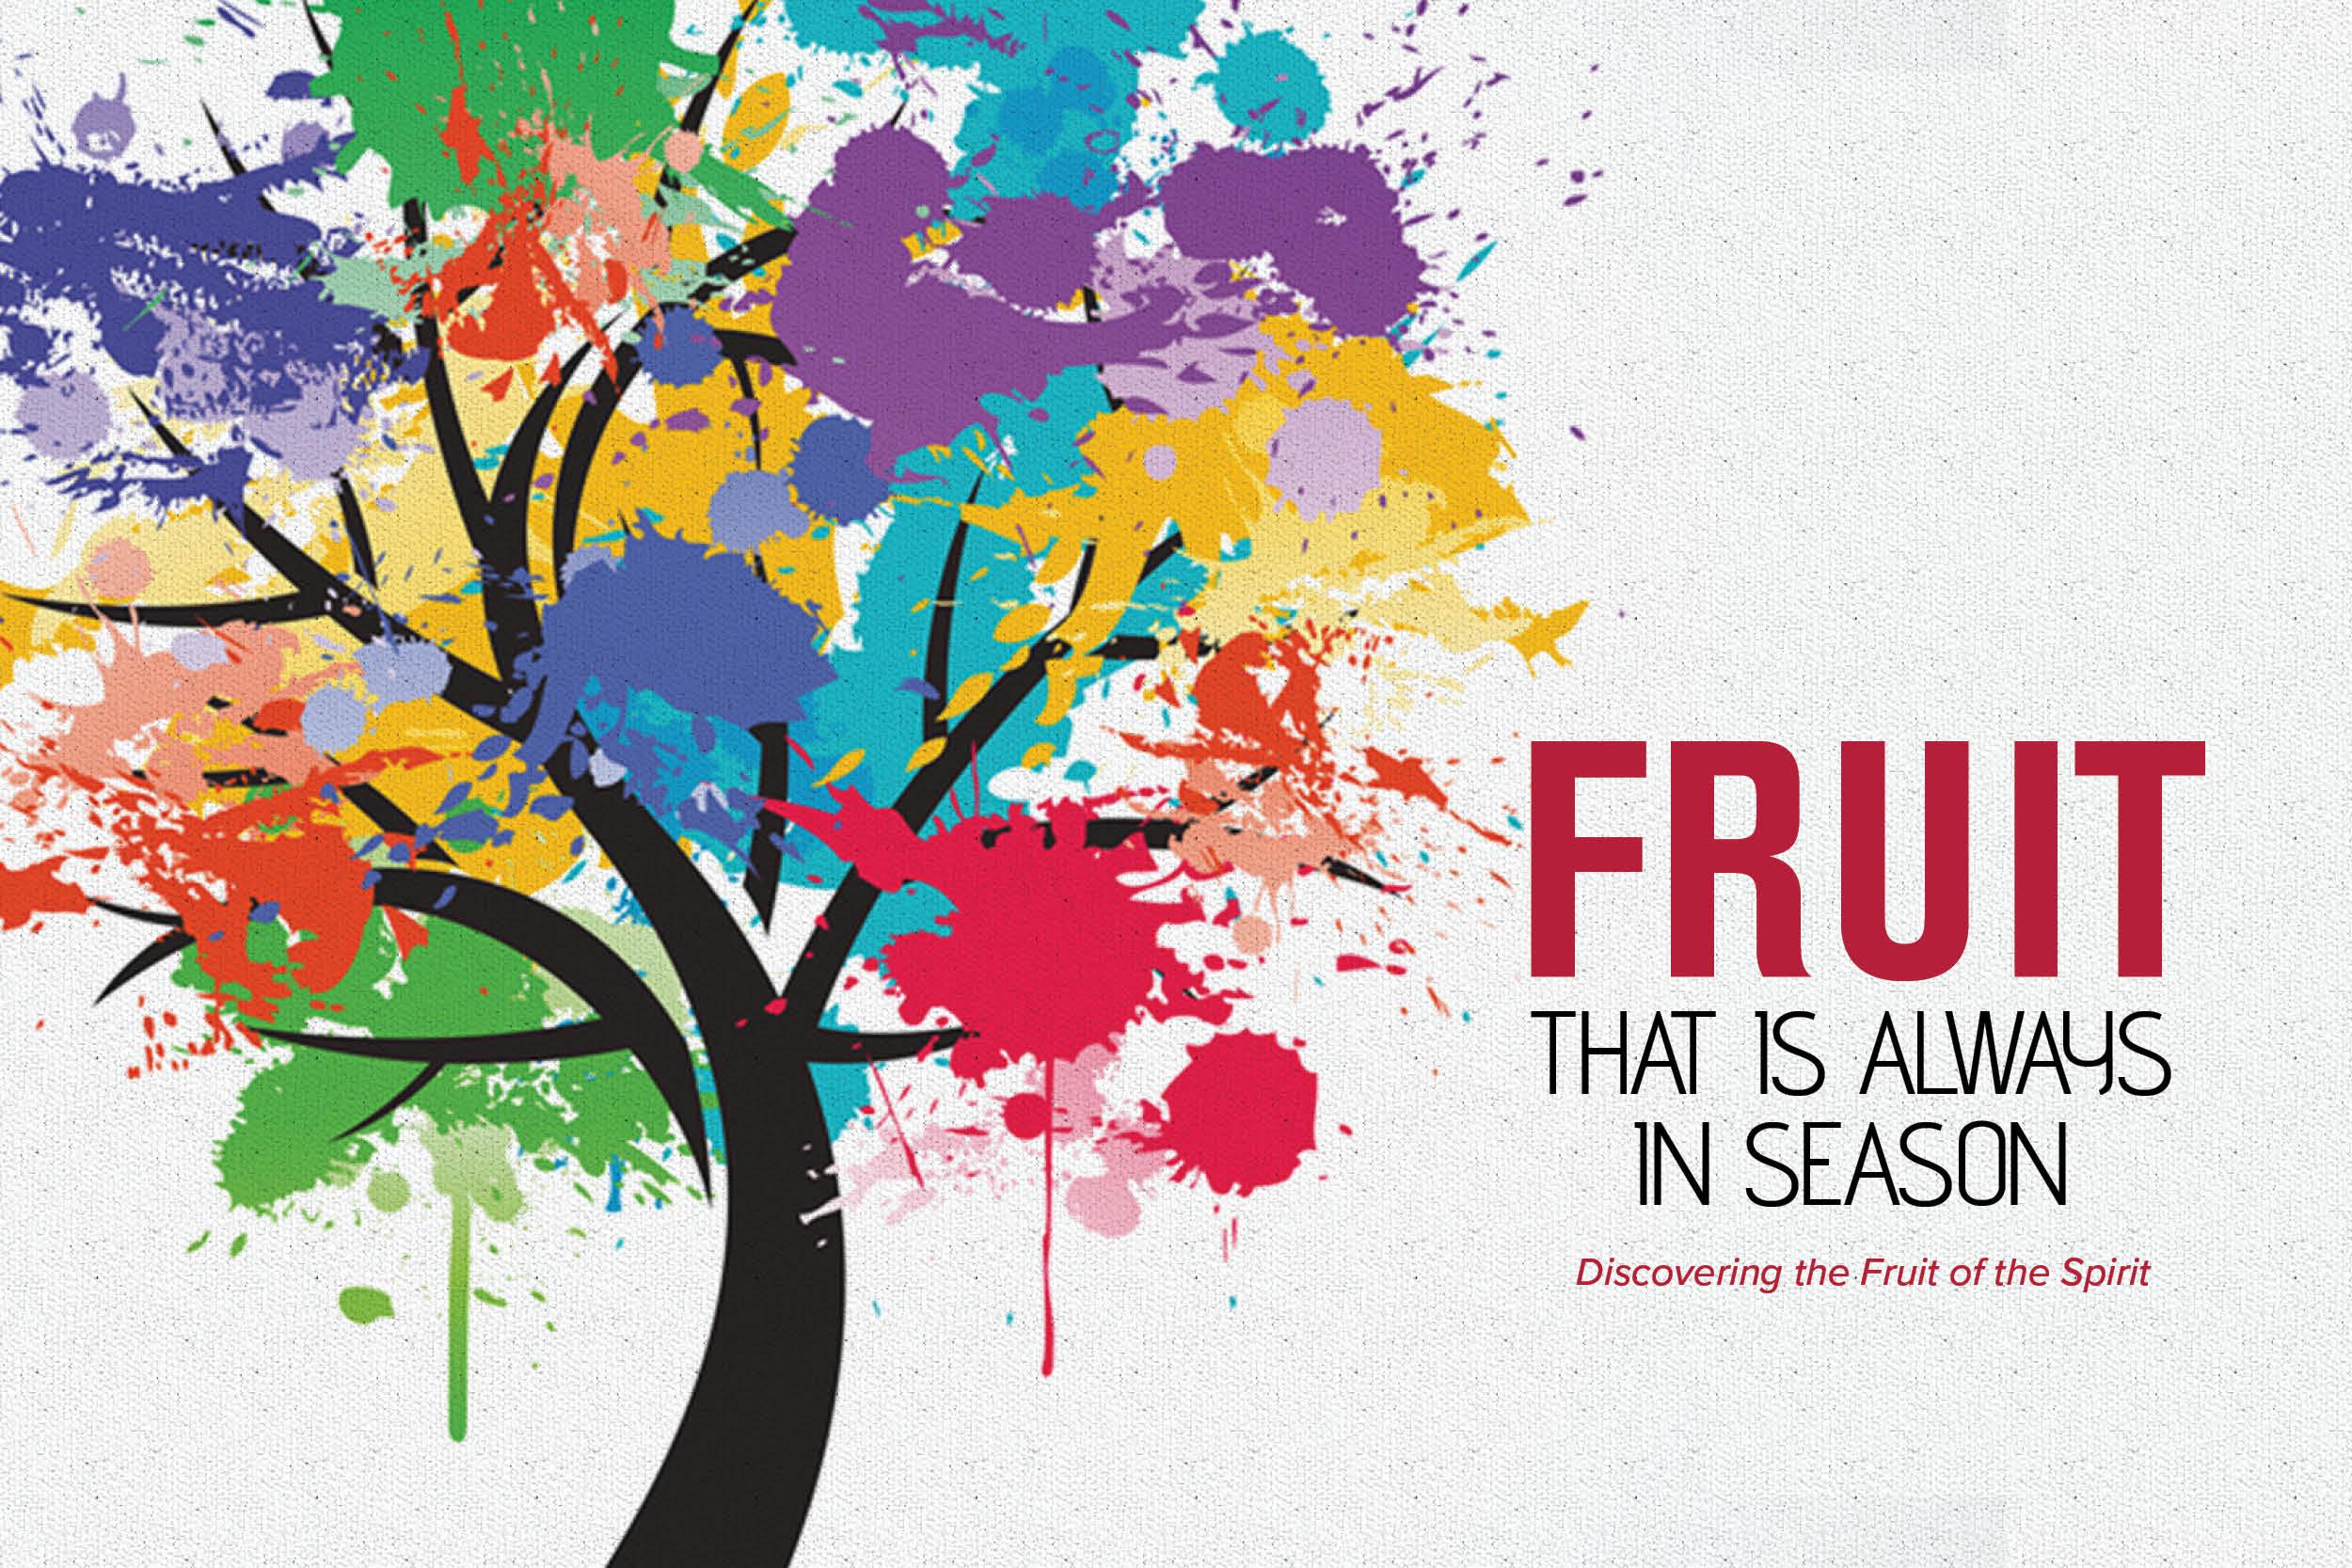 Fruit That is Always in Season